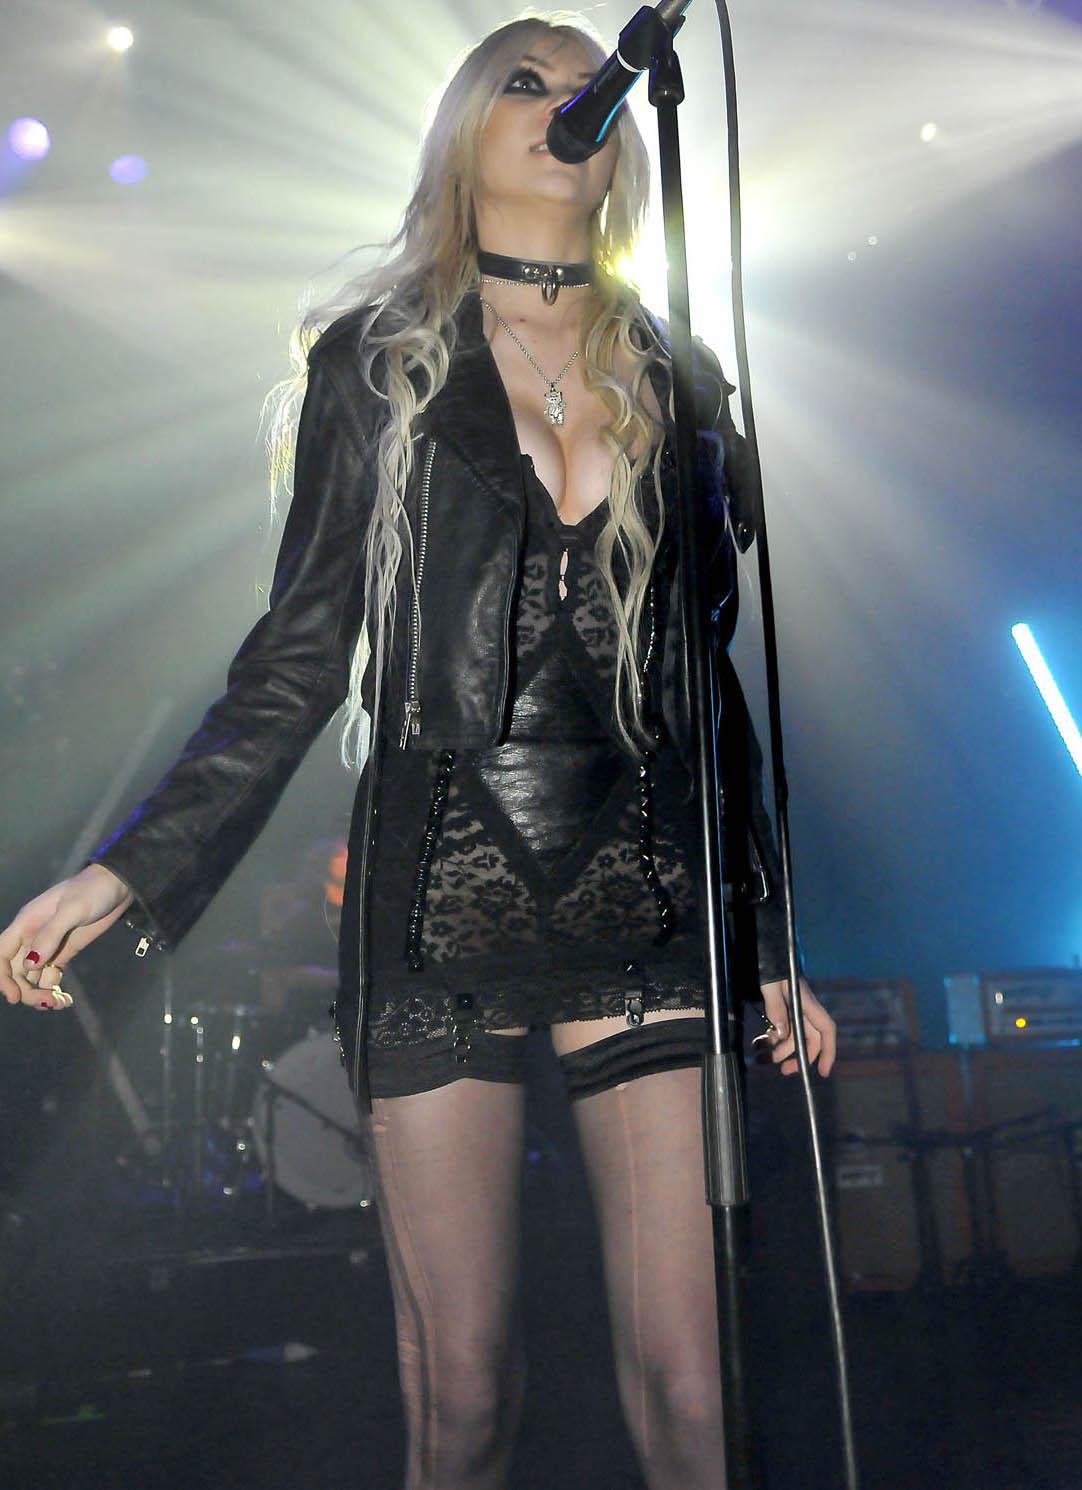 http://4.bp.blogspot.com/-IvbU9Od1zsw/TaFuMW0fQ6I/AAAAAAAAAVg/qX9RA31fMis/s1600/Taylor+Momsen+Live+Concert+Stills.jpg